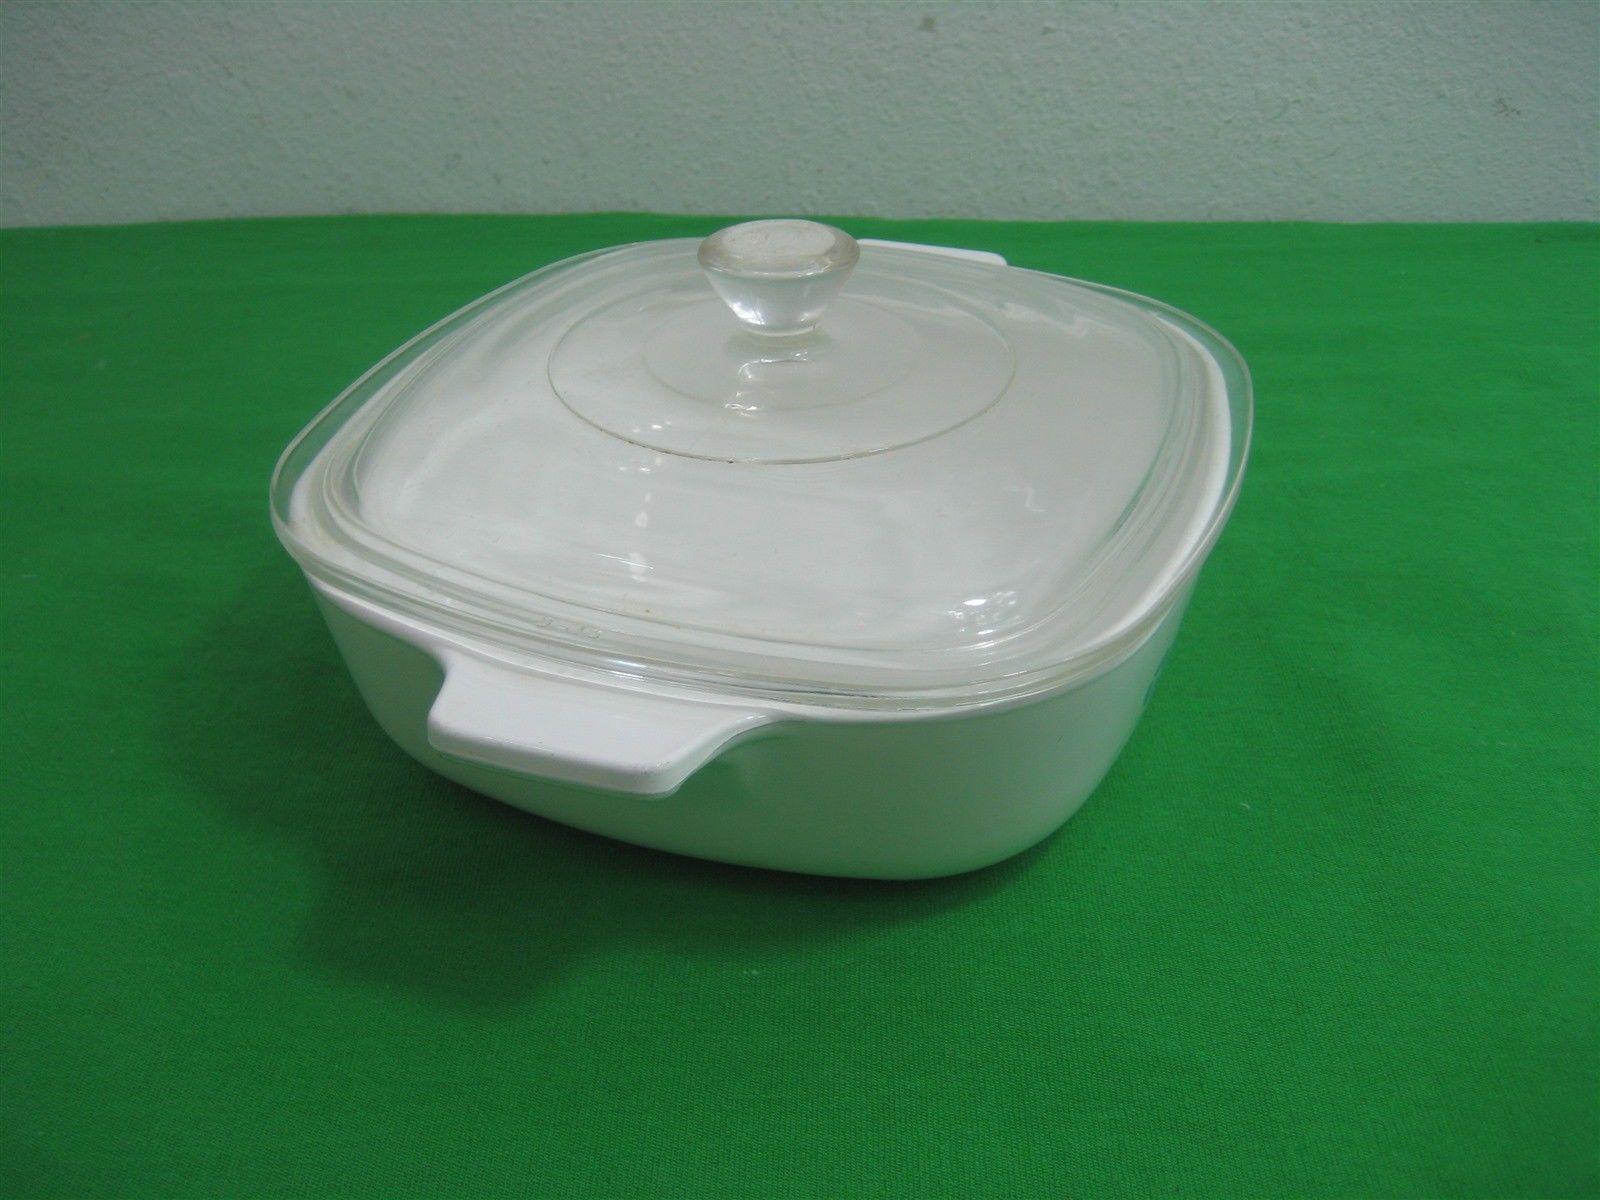 BLUE CORNFLOWER 1 Quart Casserole Dish P-1-B Corning Ware